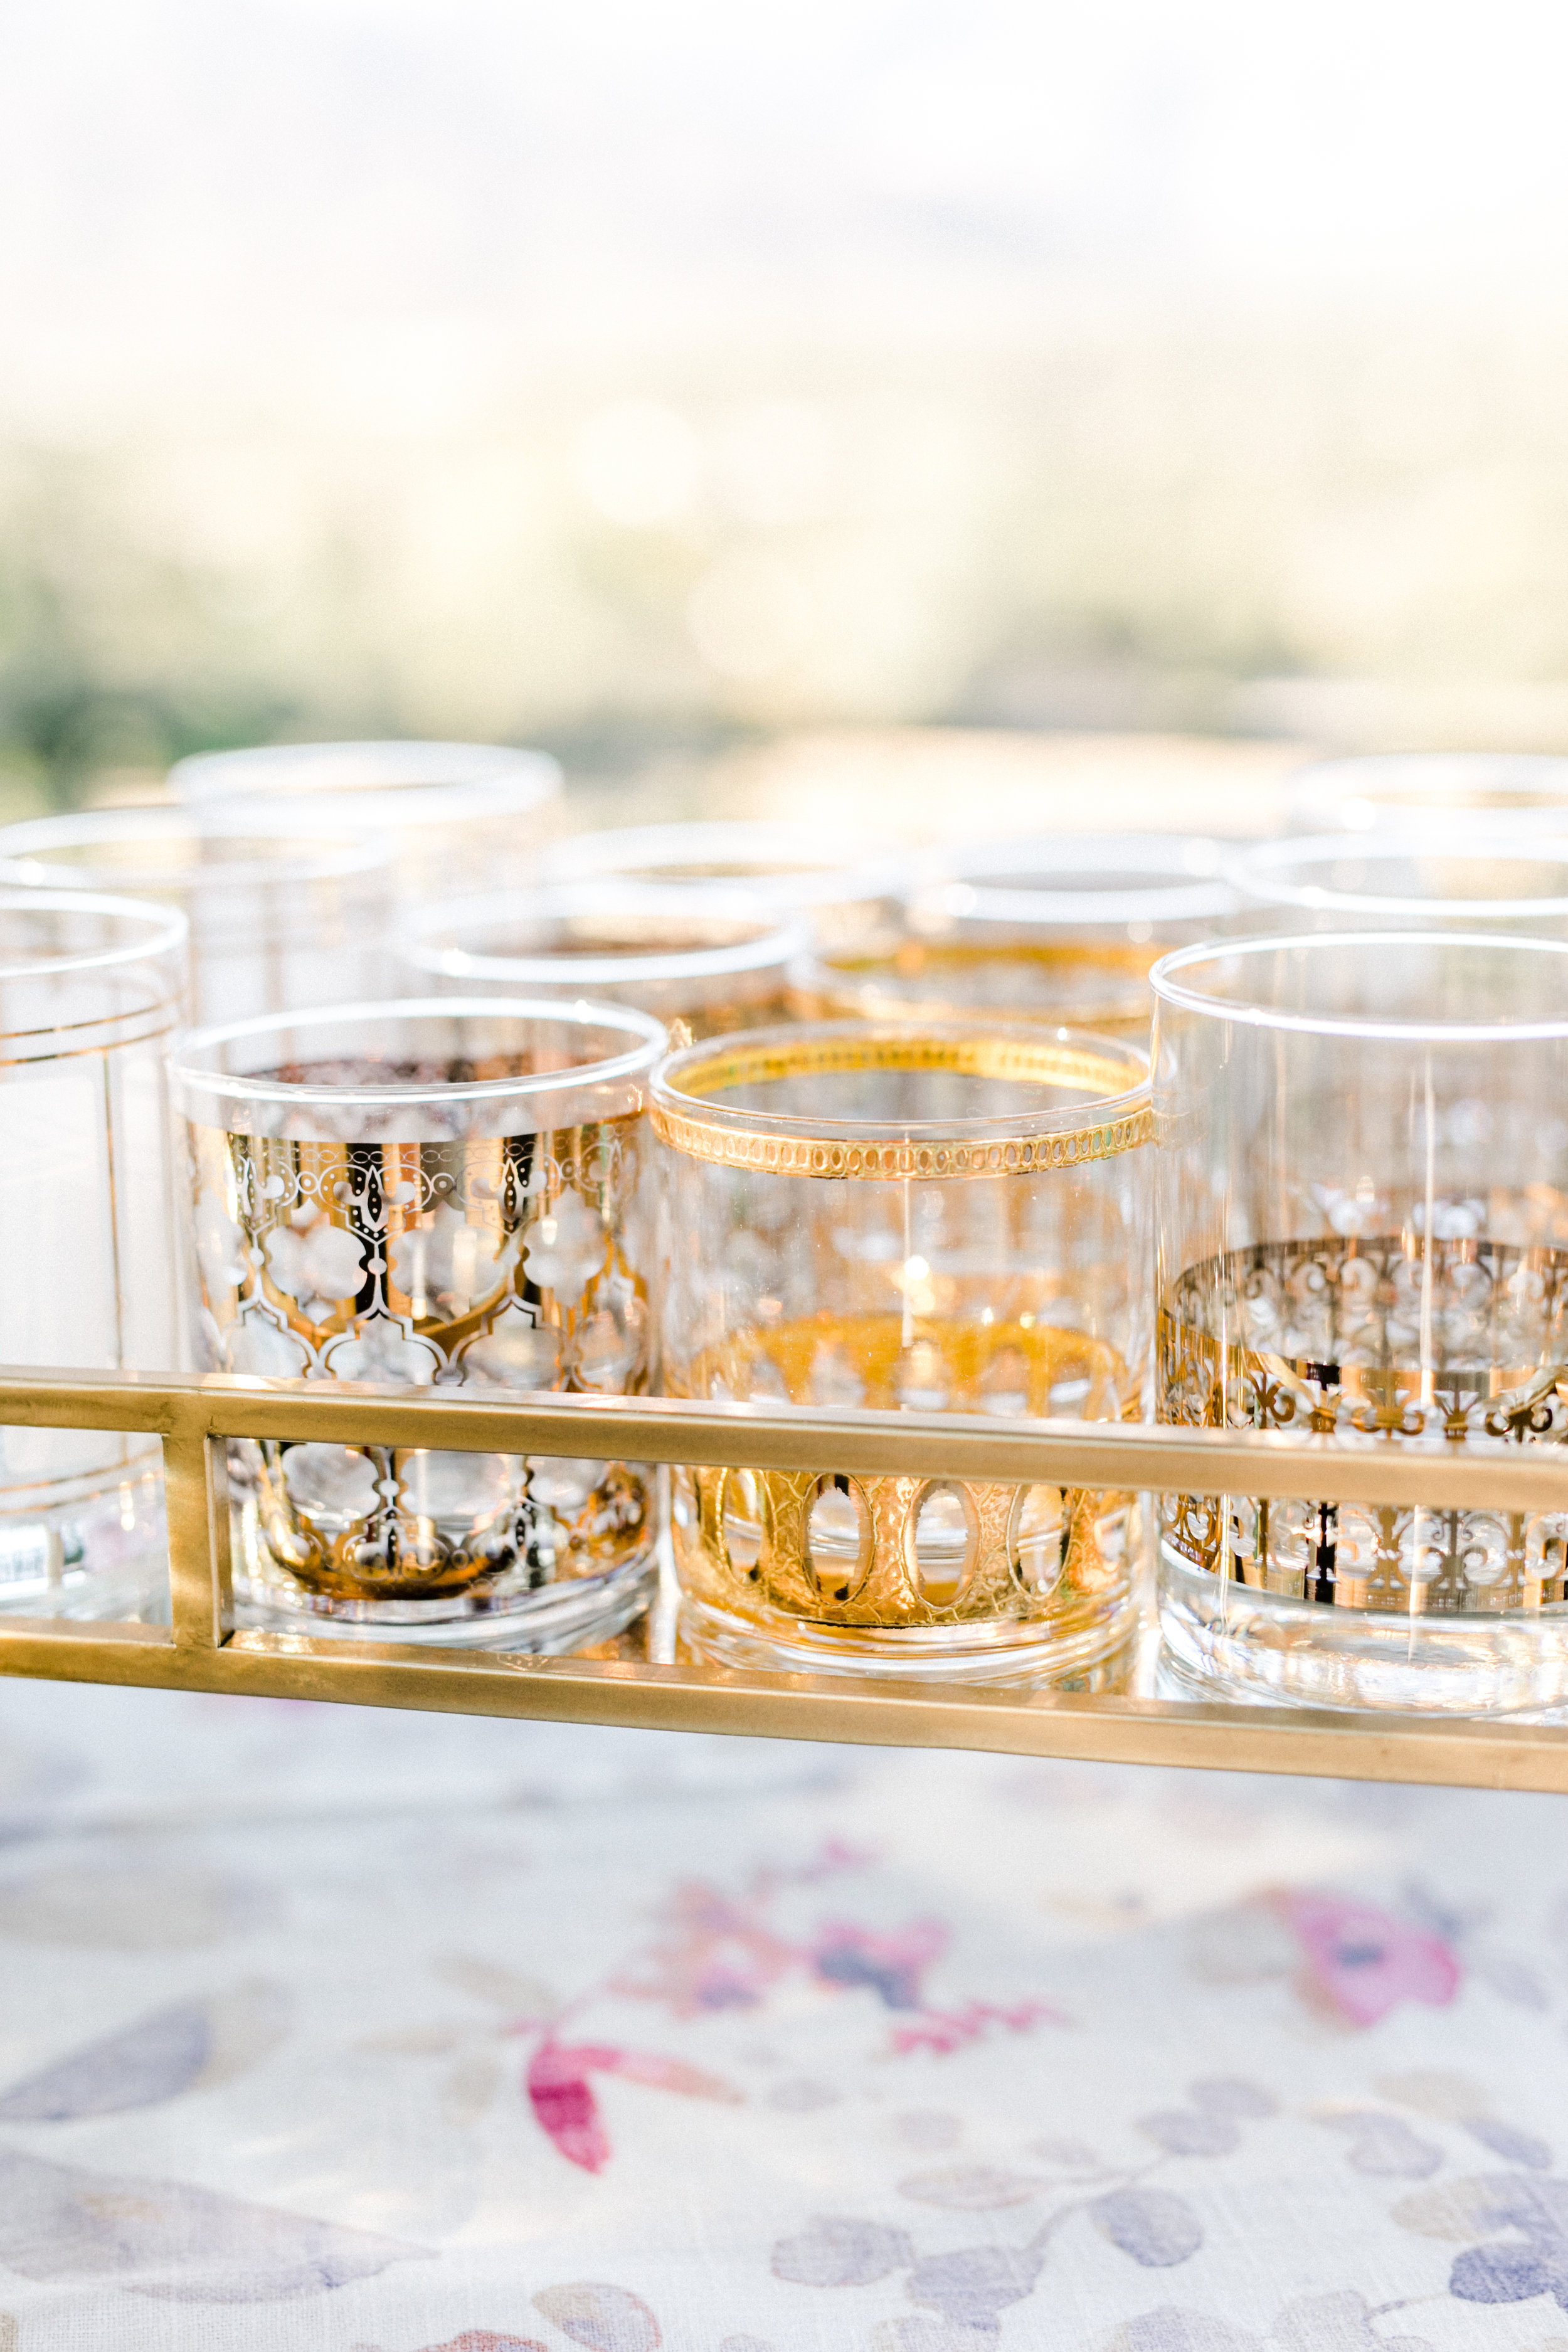 gold-patterned cocktail glasses